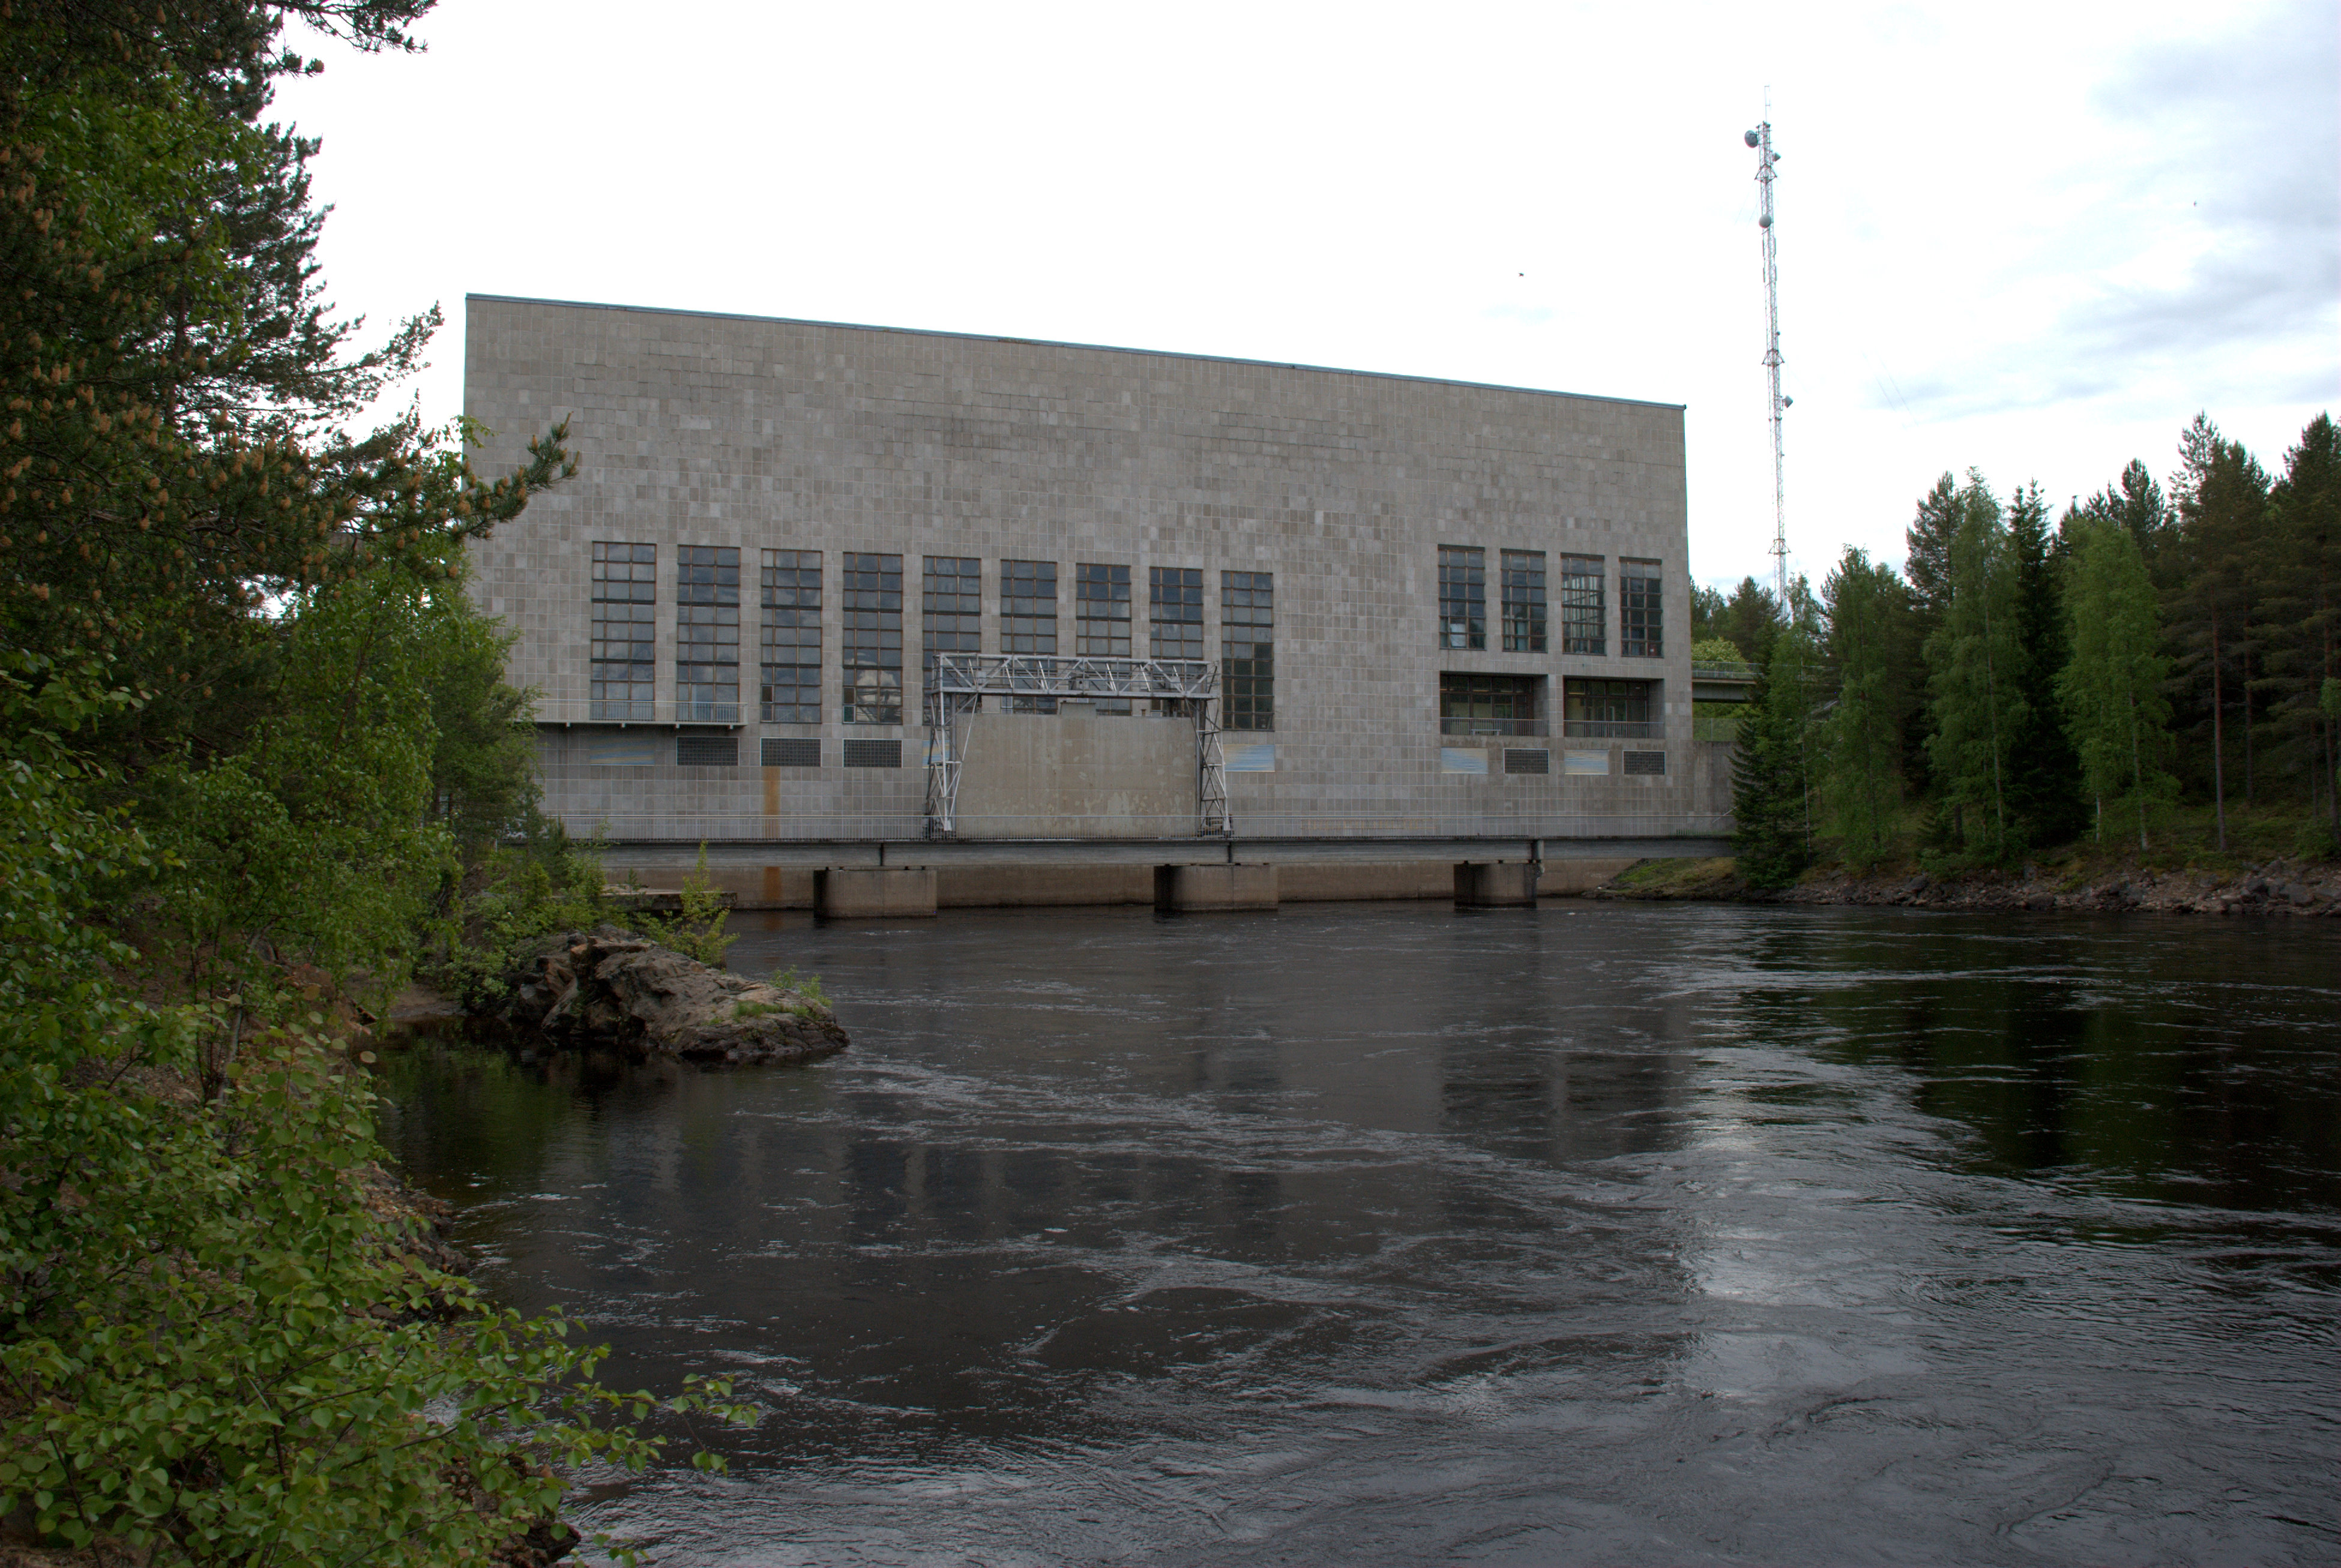 Pälli hydro power plant